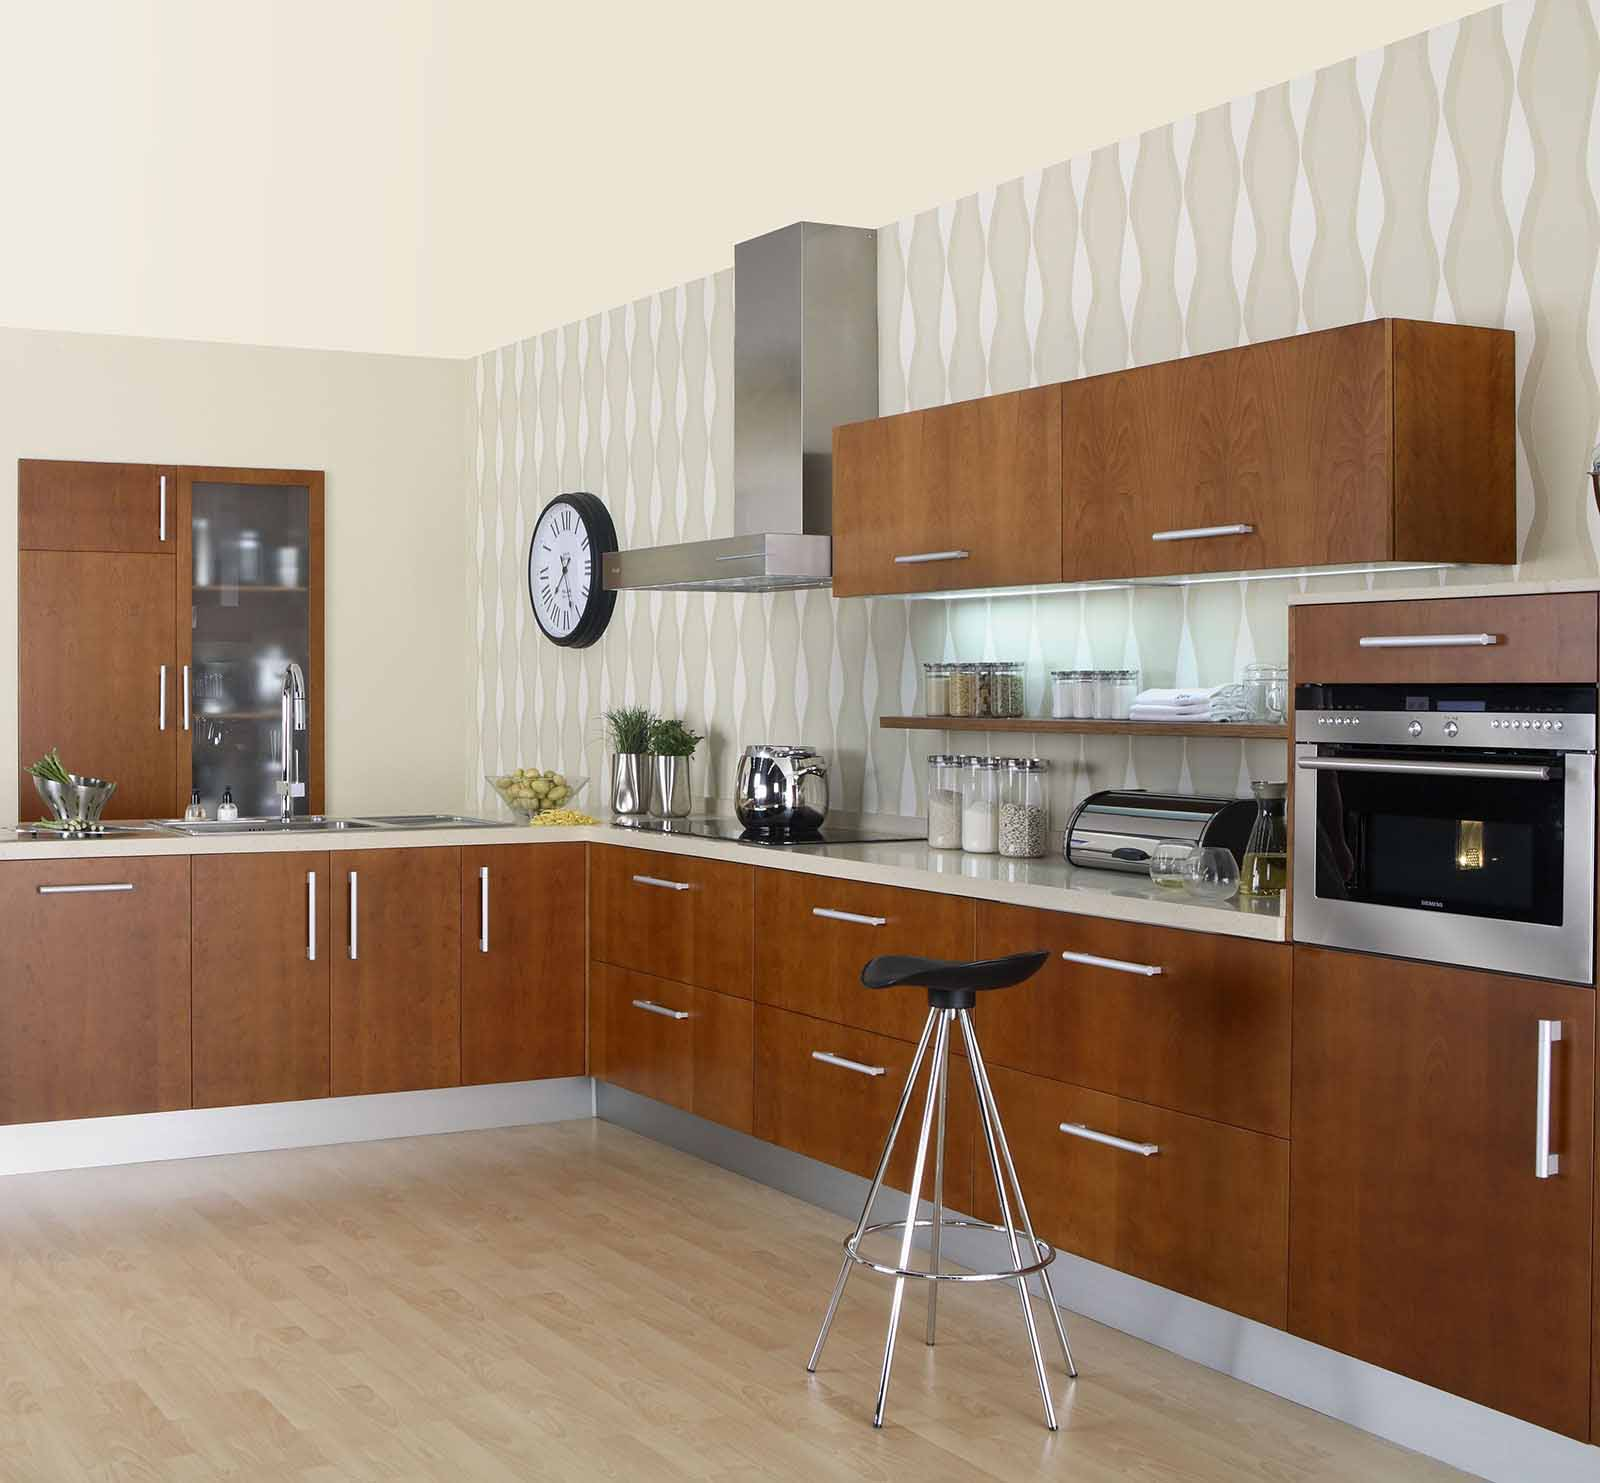 Cocina 19 cocinas capis dise o y fabricaci n de cocinas for Configurador de cocinas